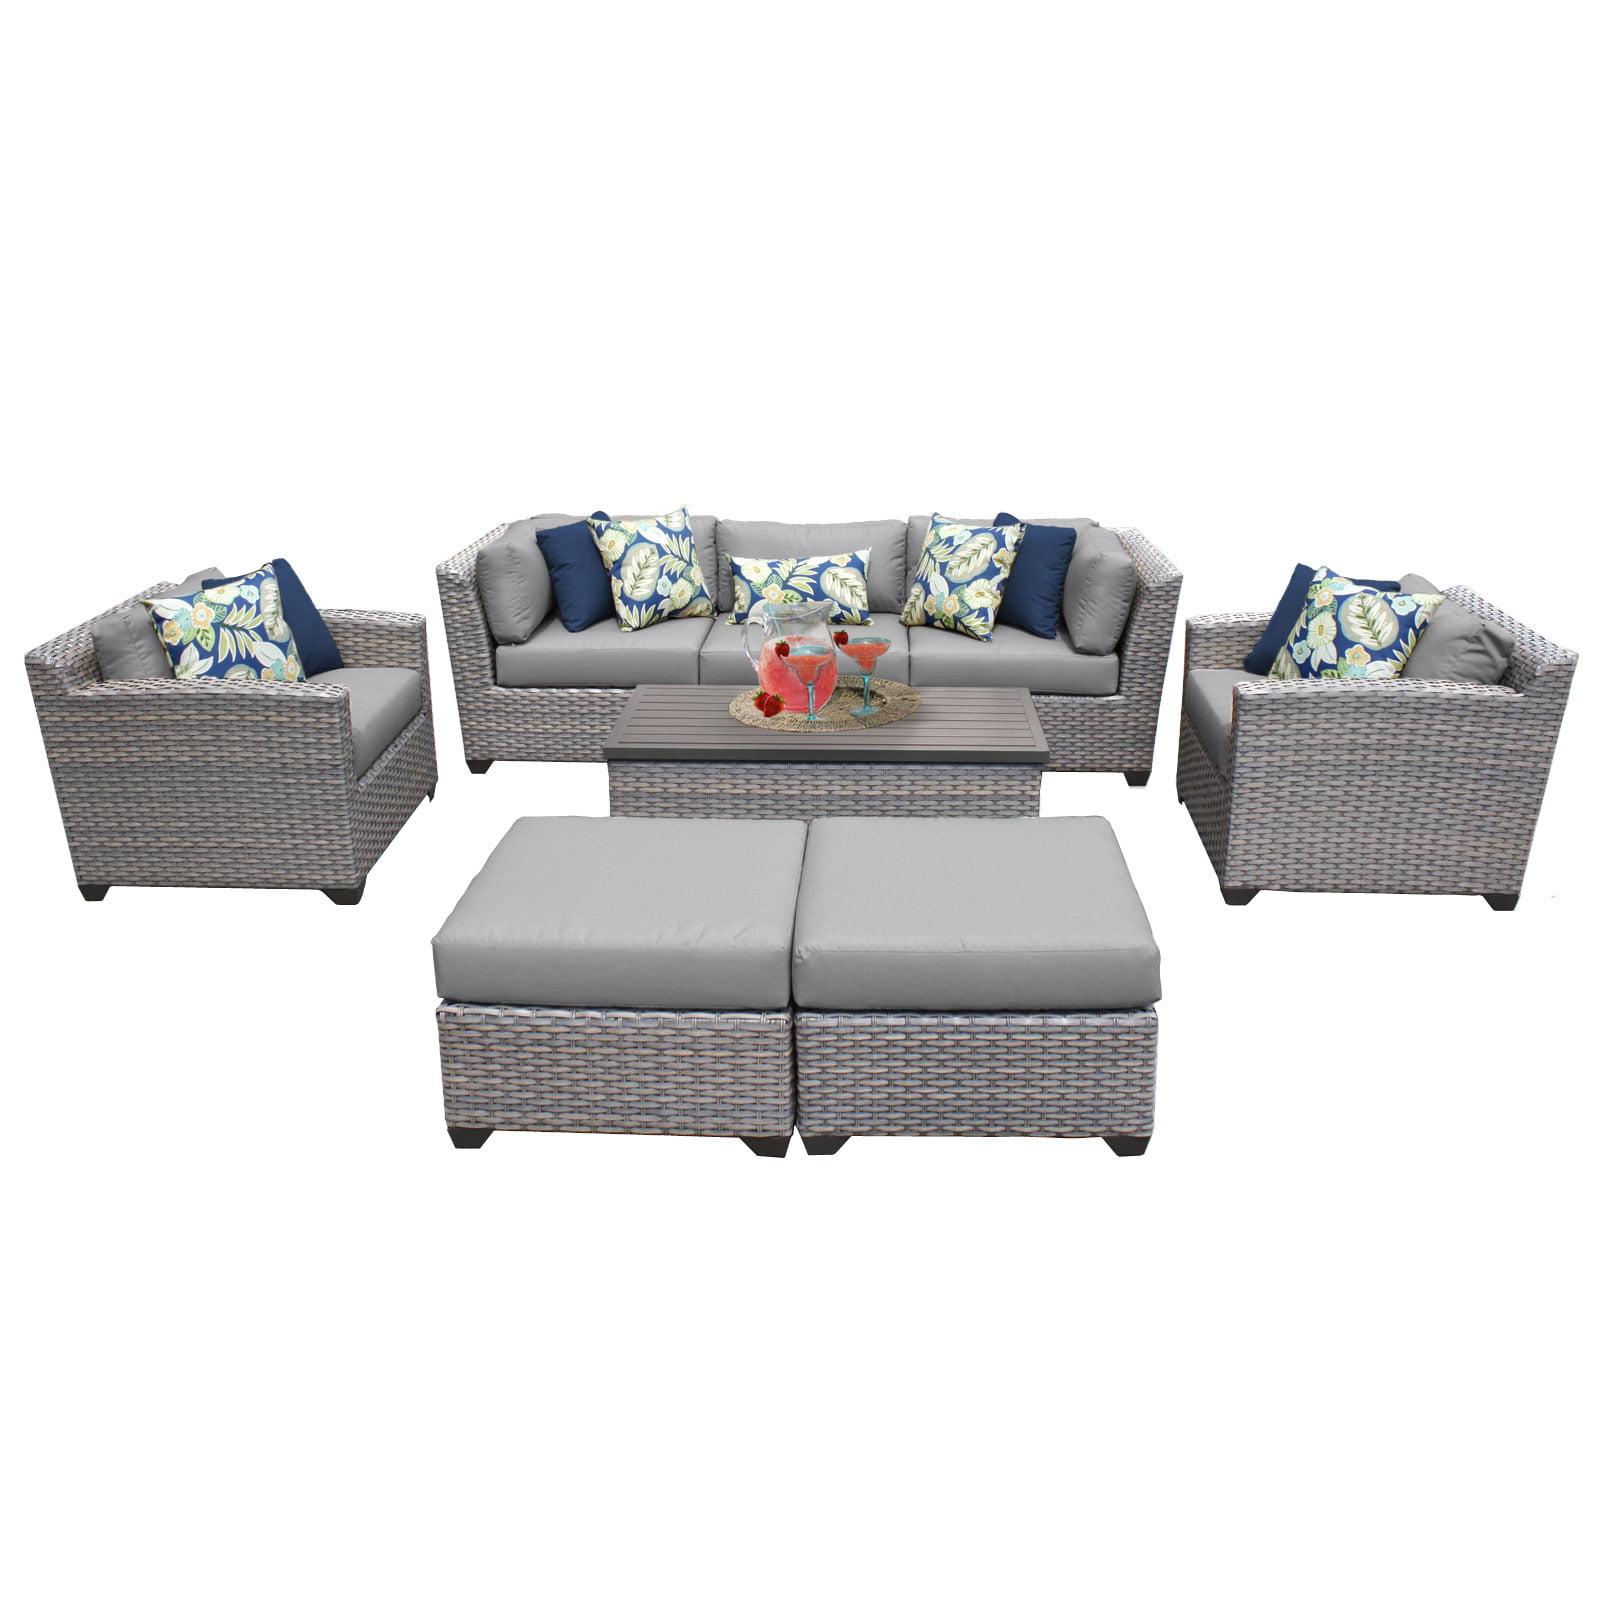 Catalina 8 Piece Outdoor Wicker Patio Furniture Set 08c by TK Classics